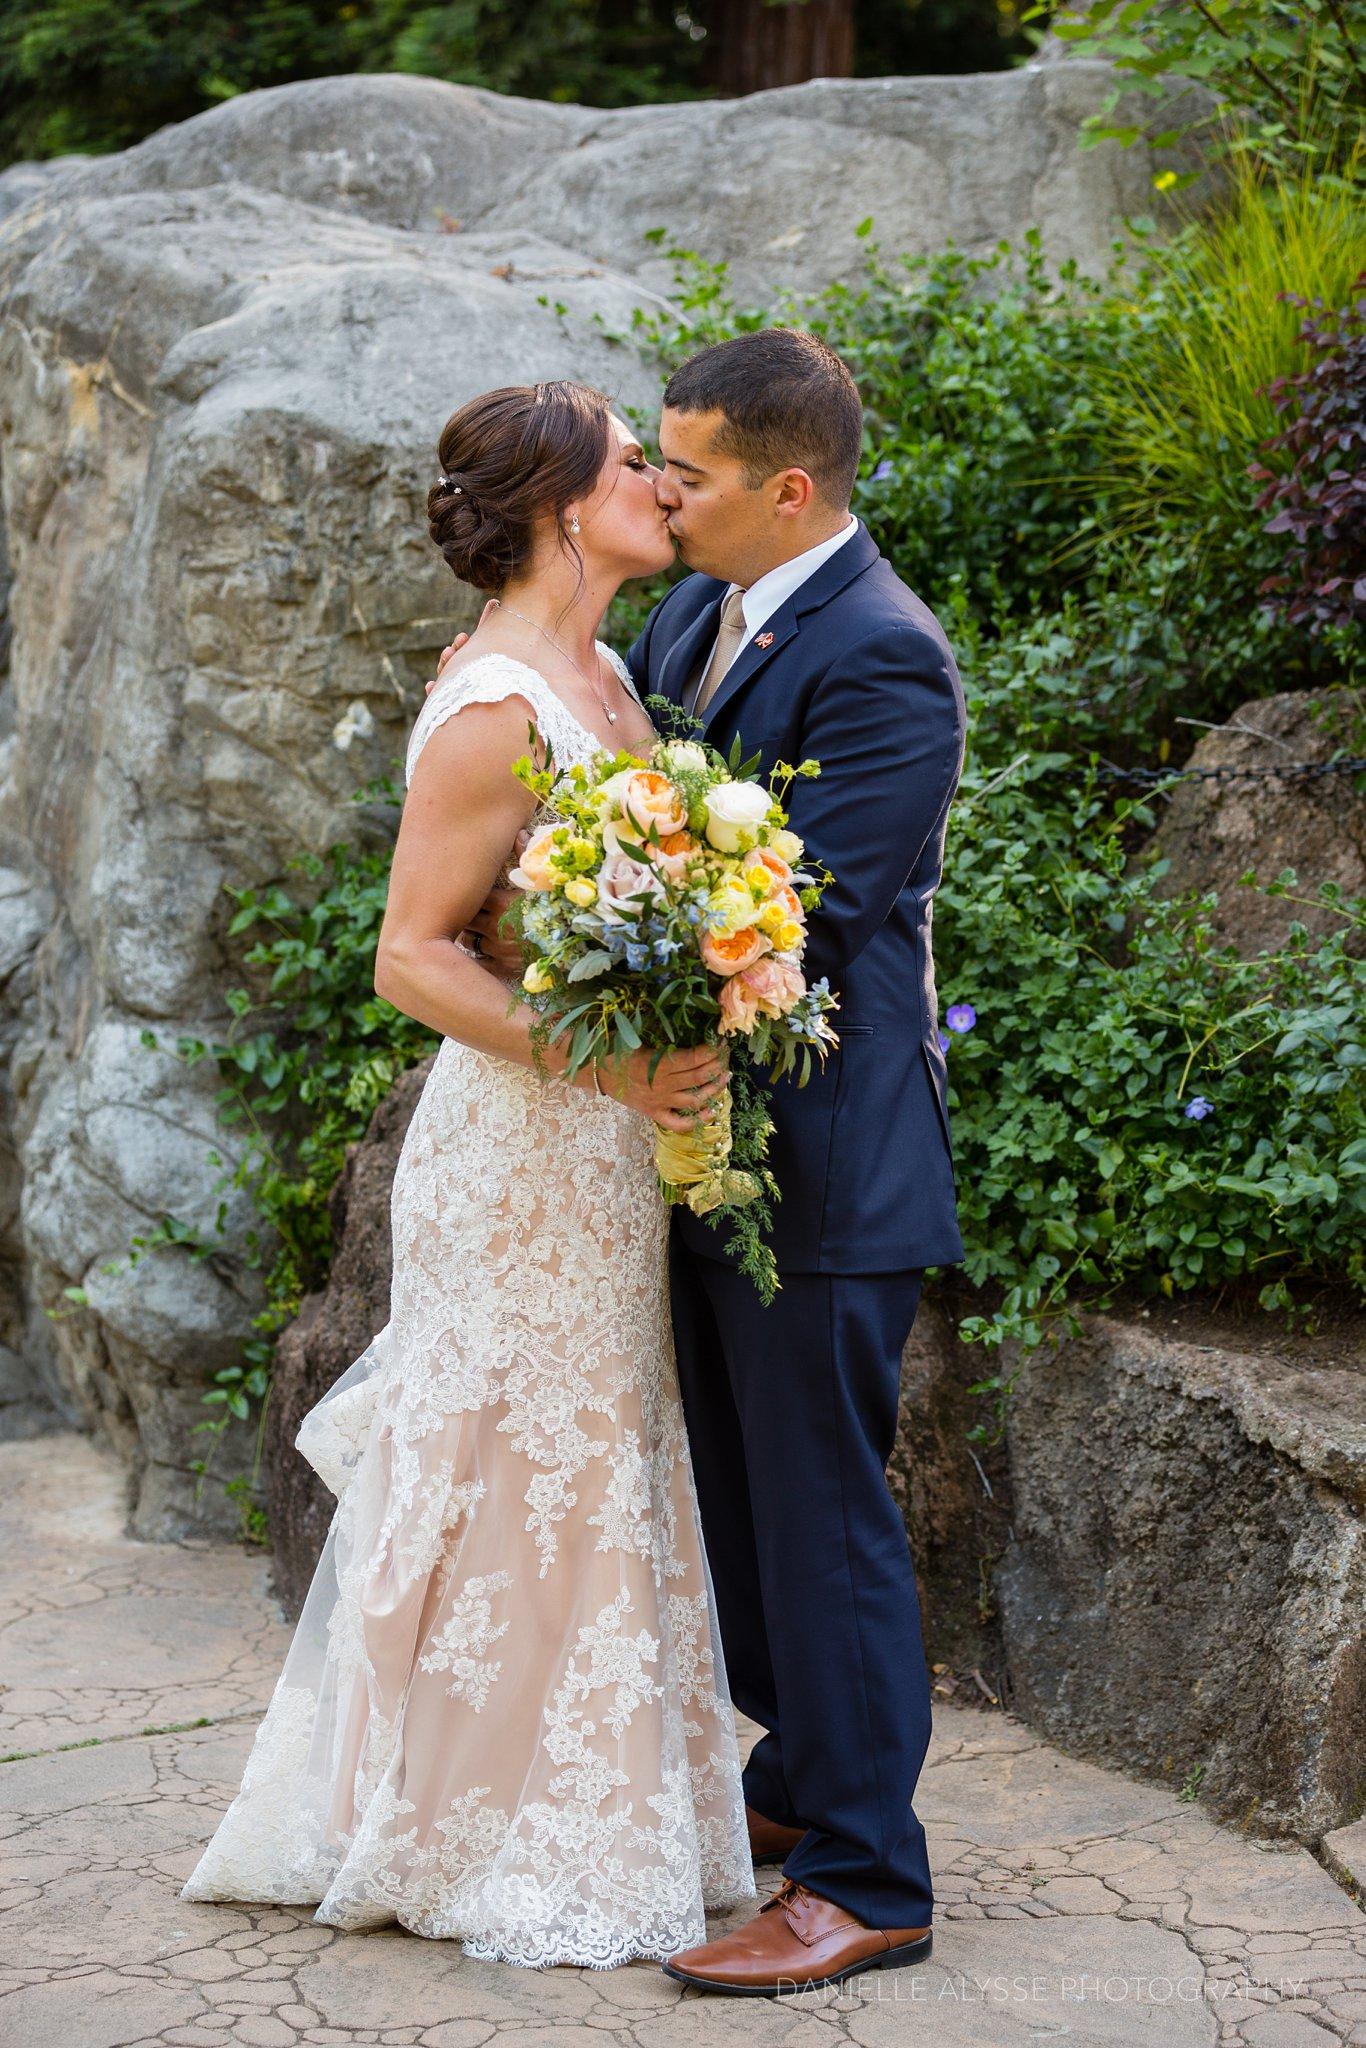 170429_blog_kimberly_ben_wedding_san_mateo_curiodyssey_danielle_alysse_photography_sacramento_photographer0382_WEB.jpg